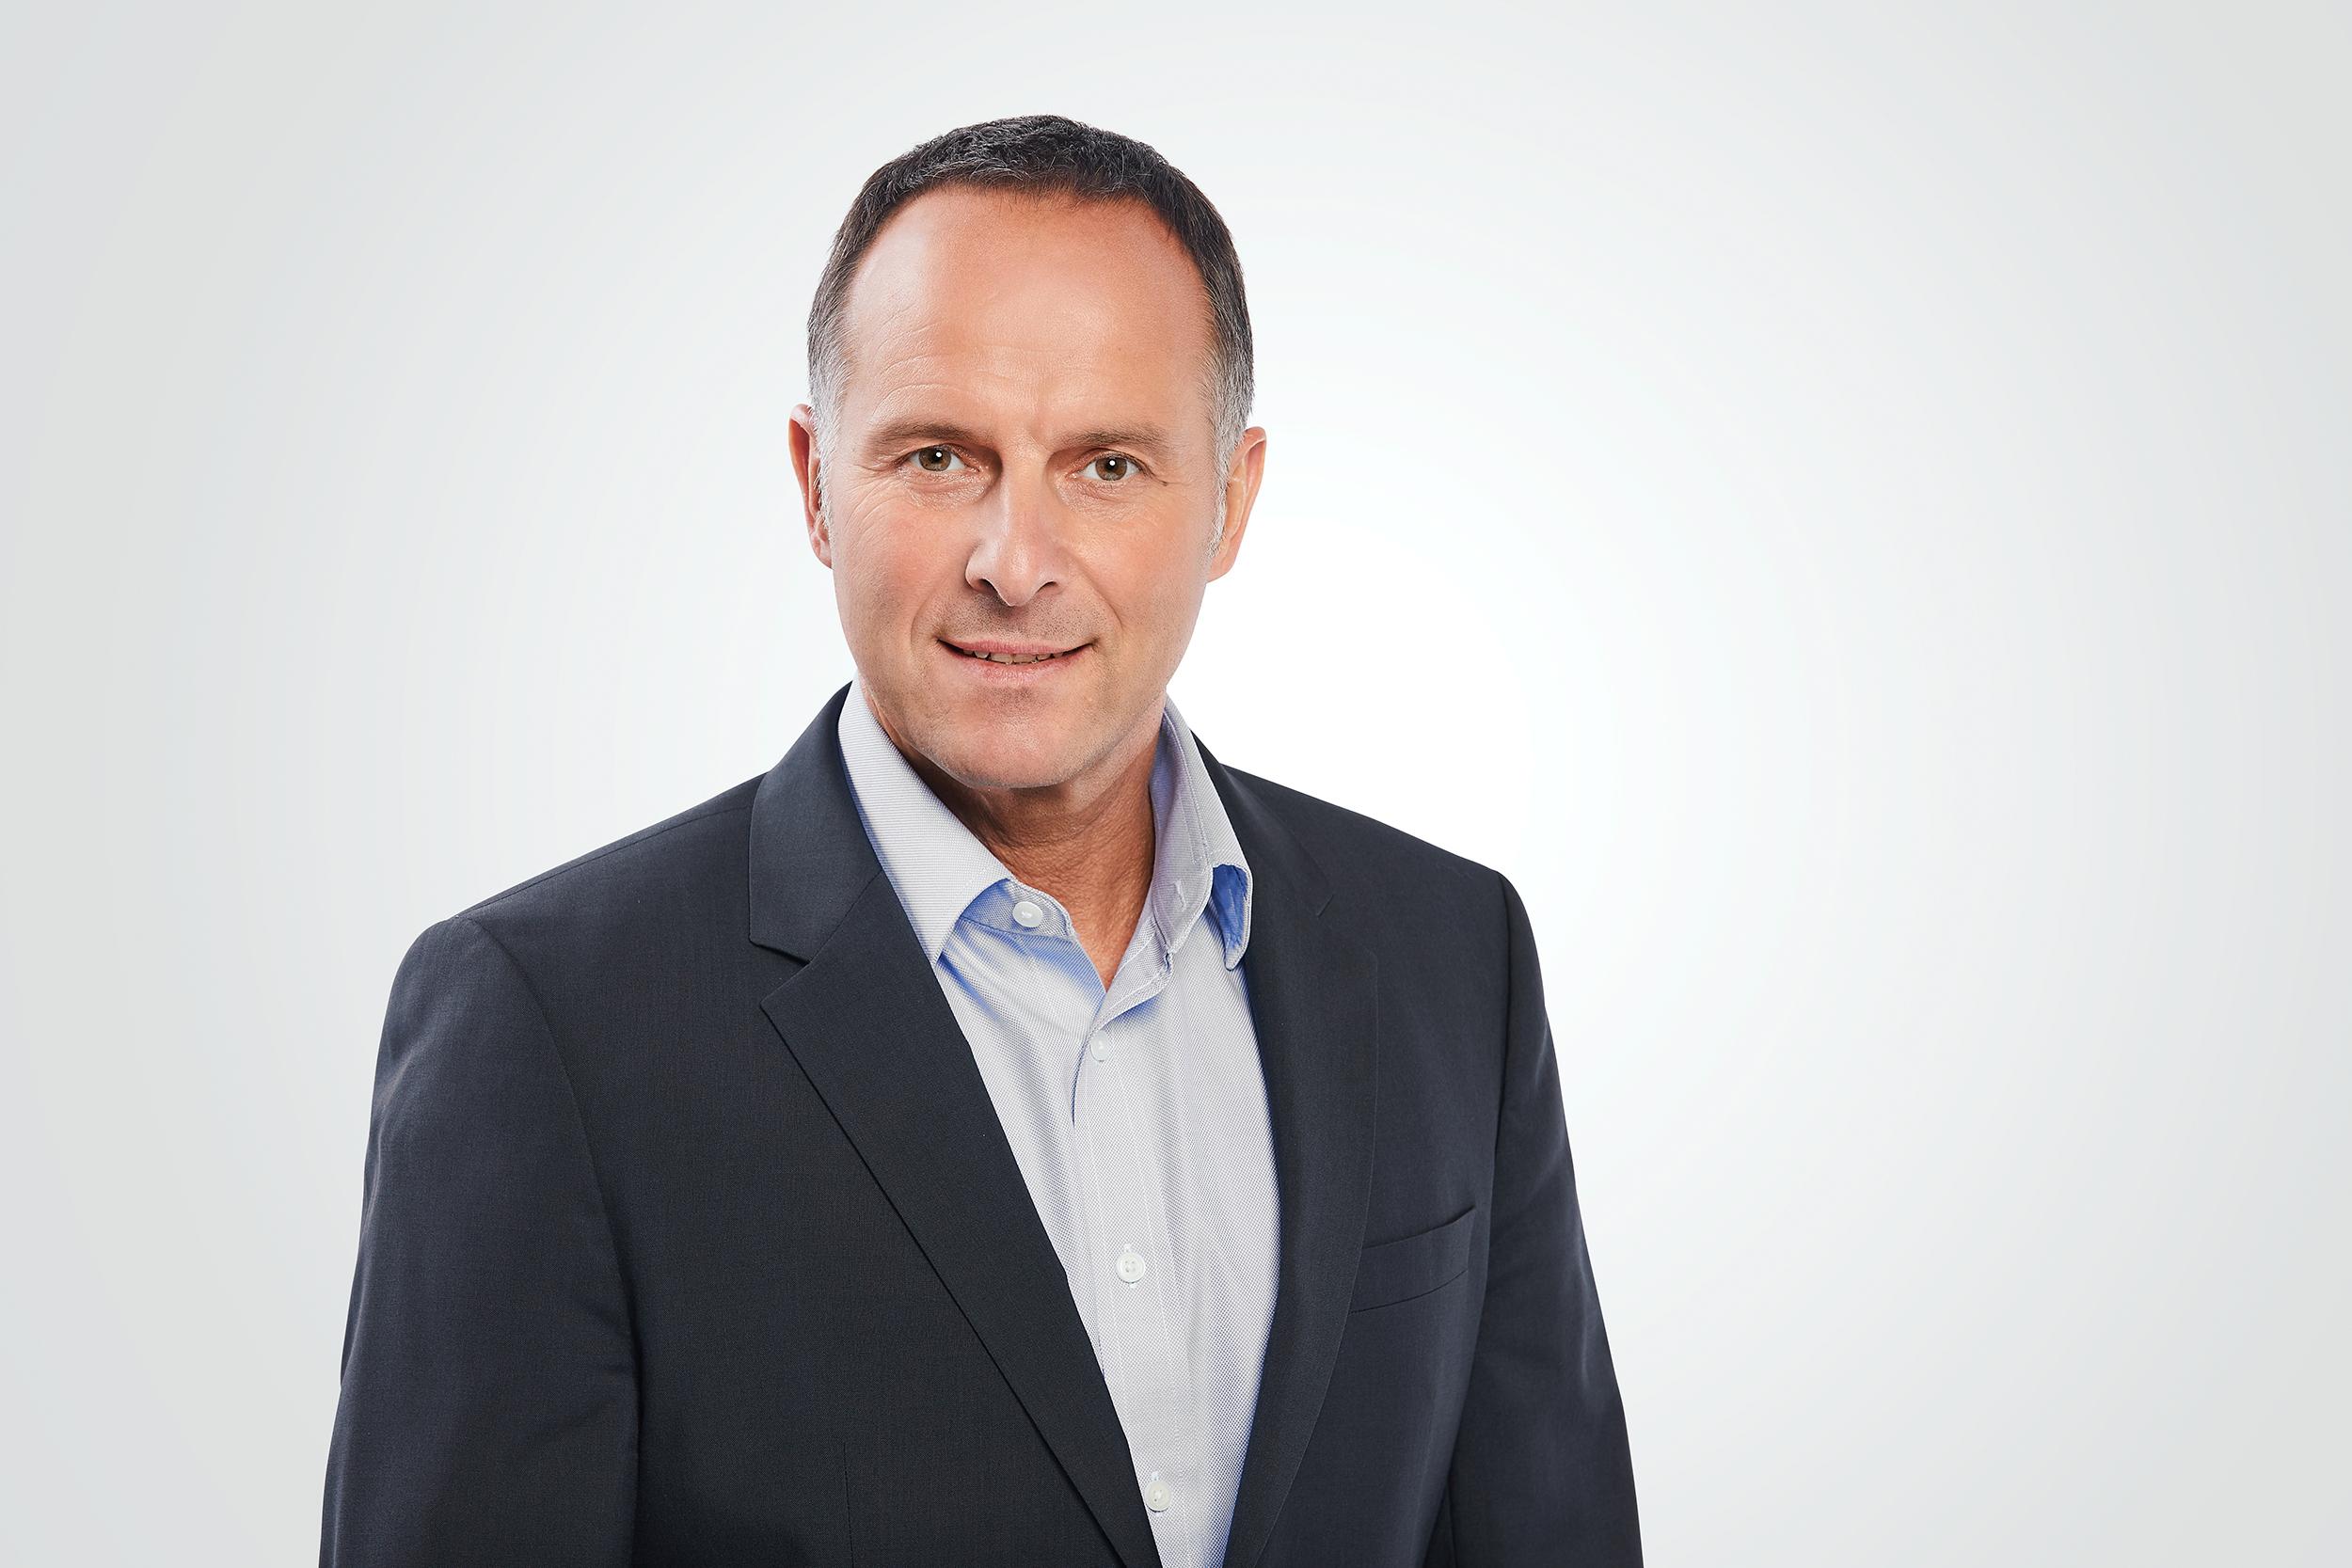 Michael Reizel